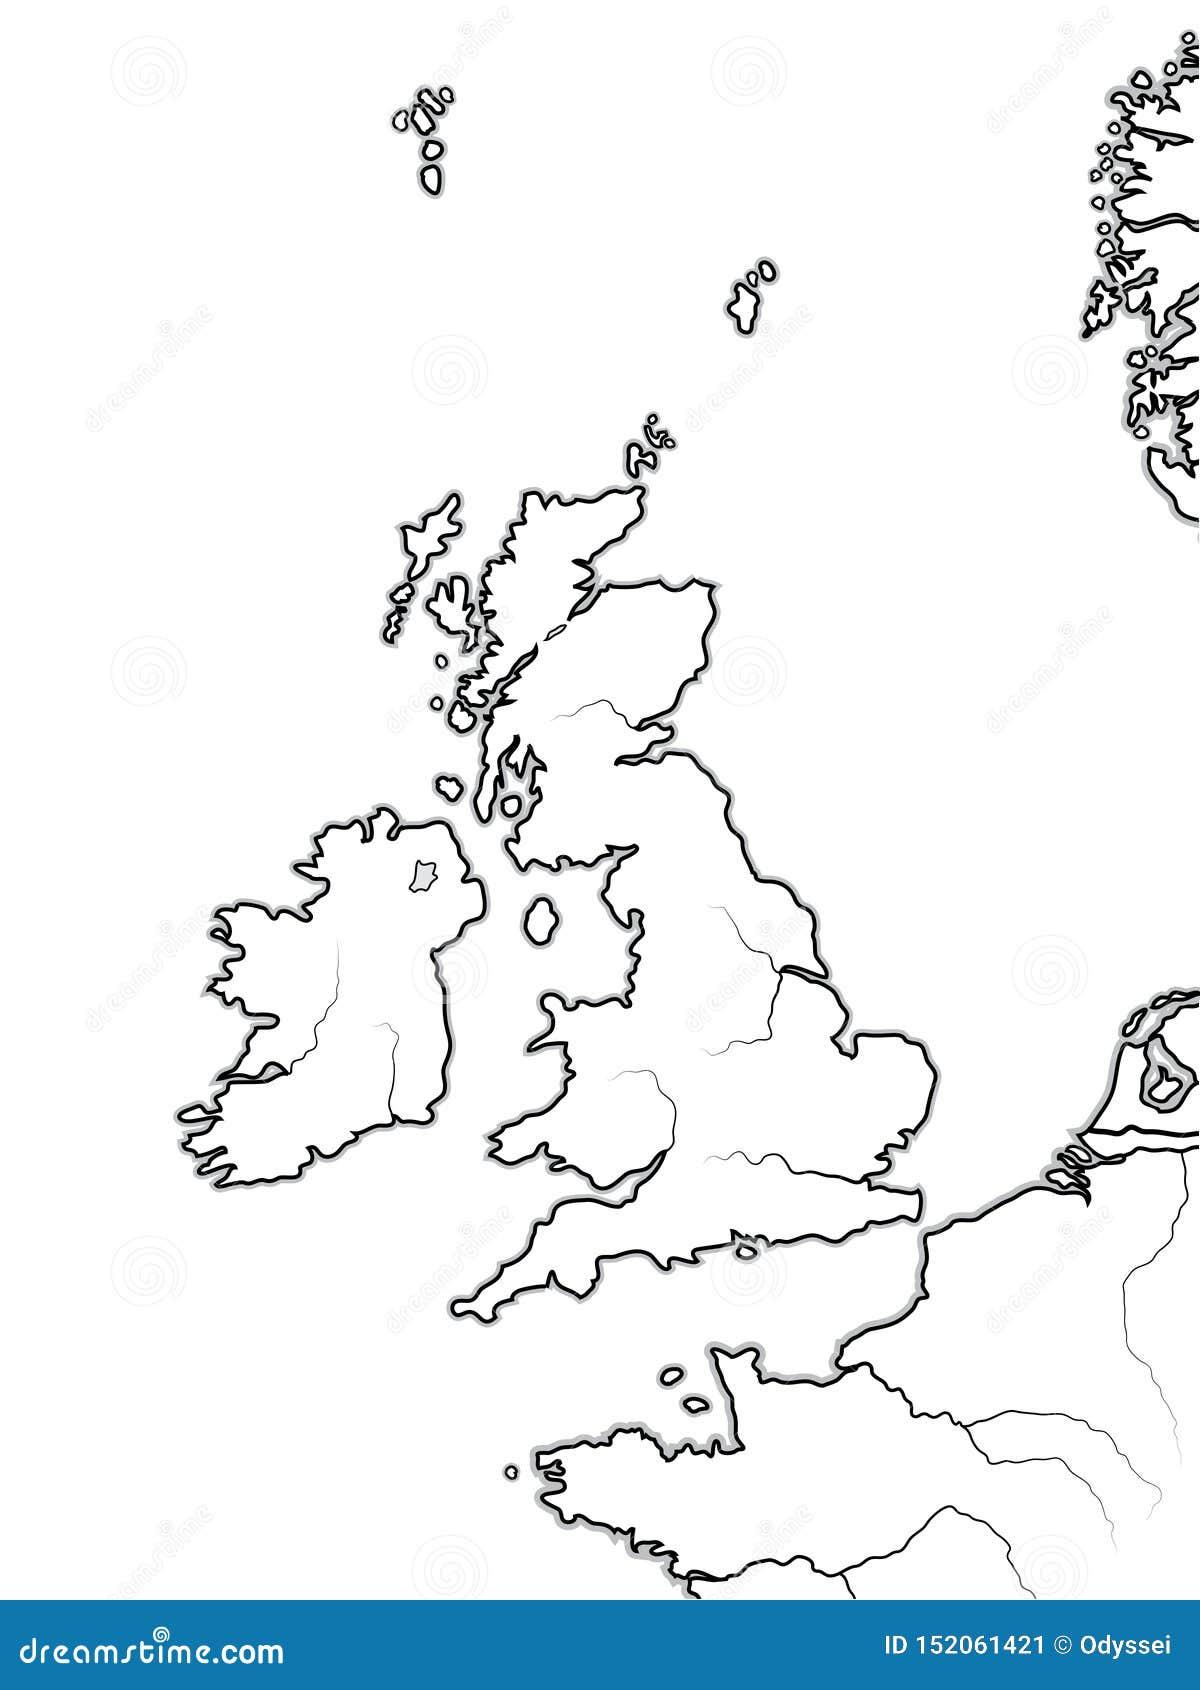 Map Of Uk Coastline.Map Of The English Lands Uk Great Britain England Scotland